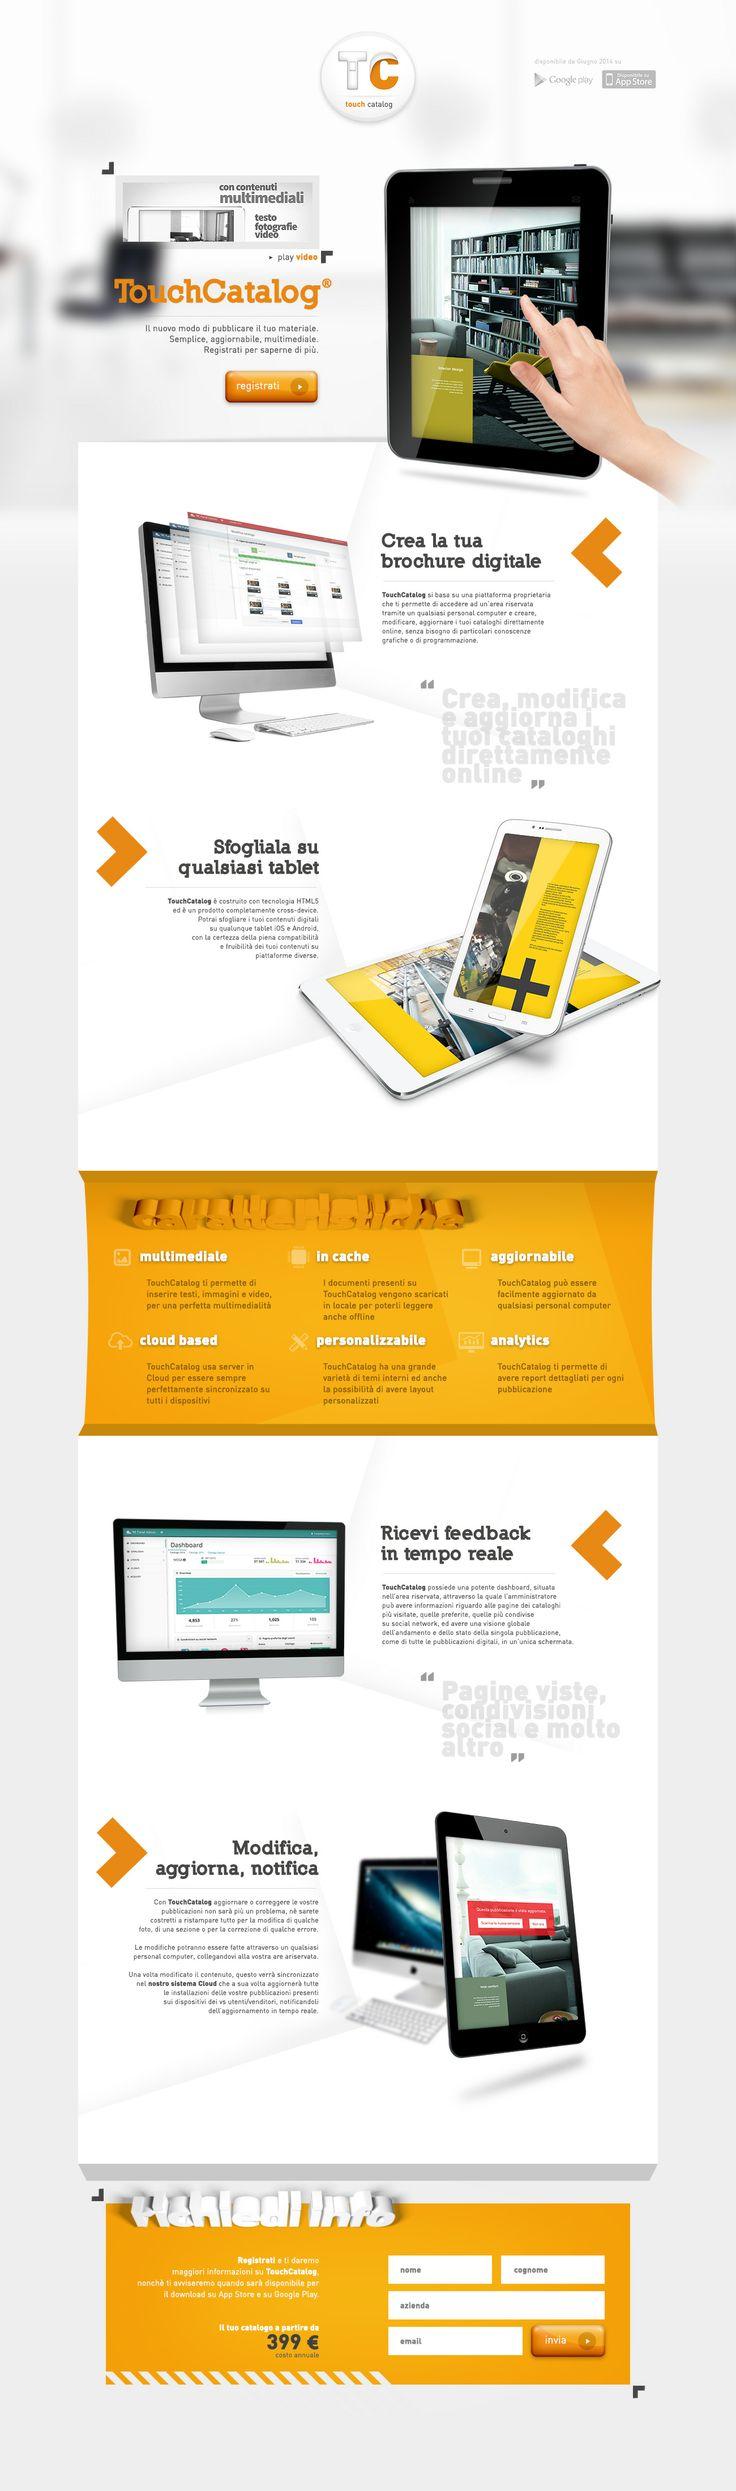 Touch Catalog web site